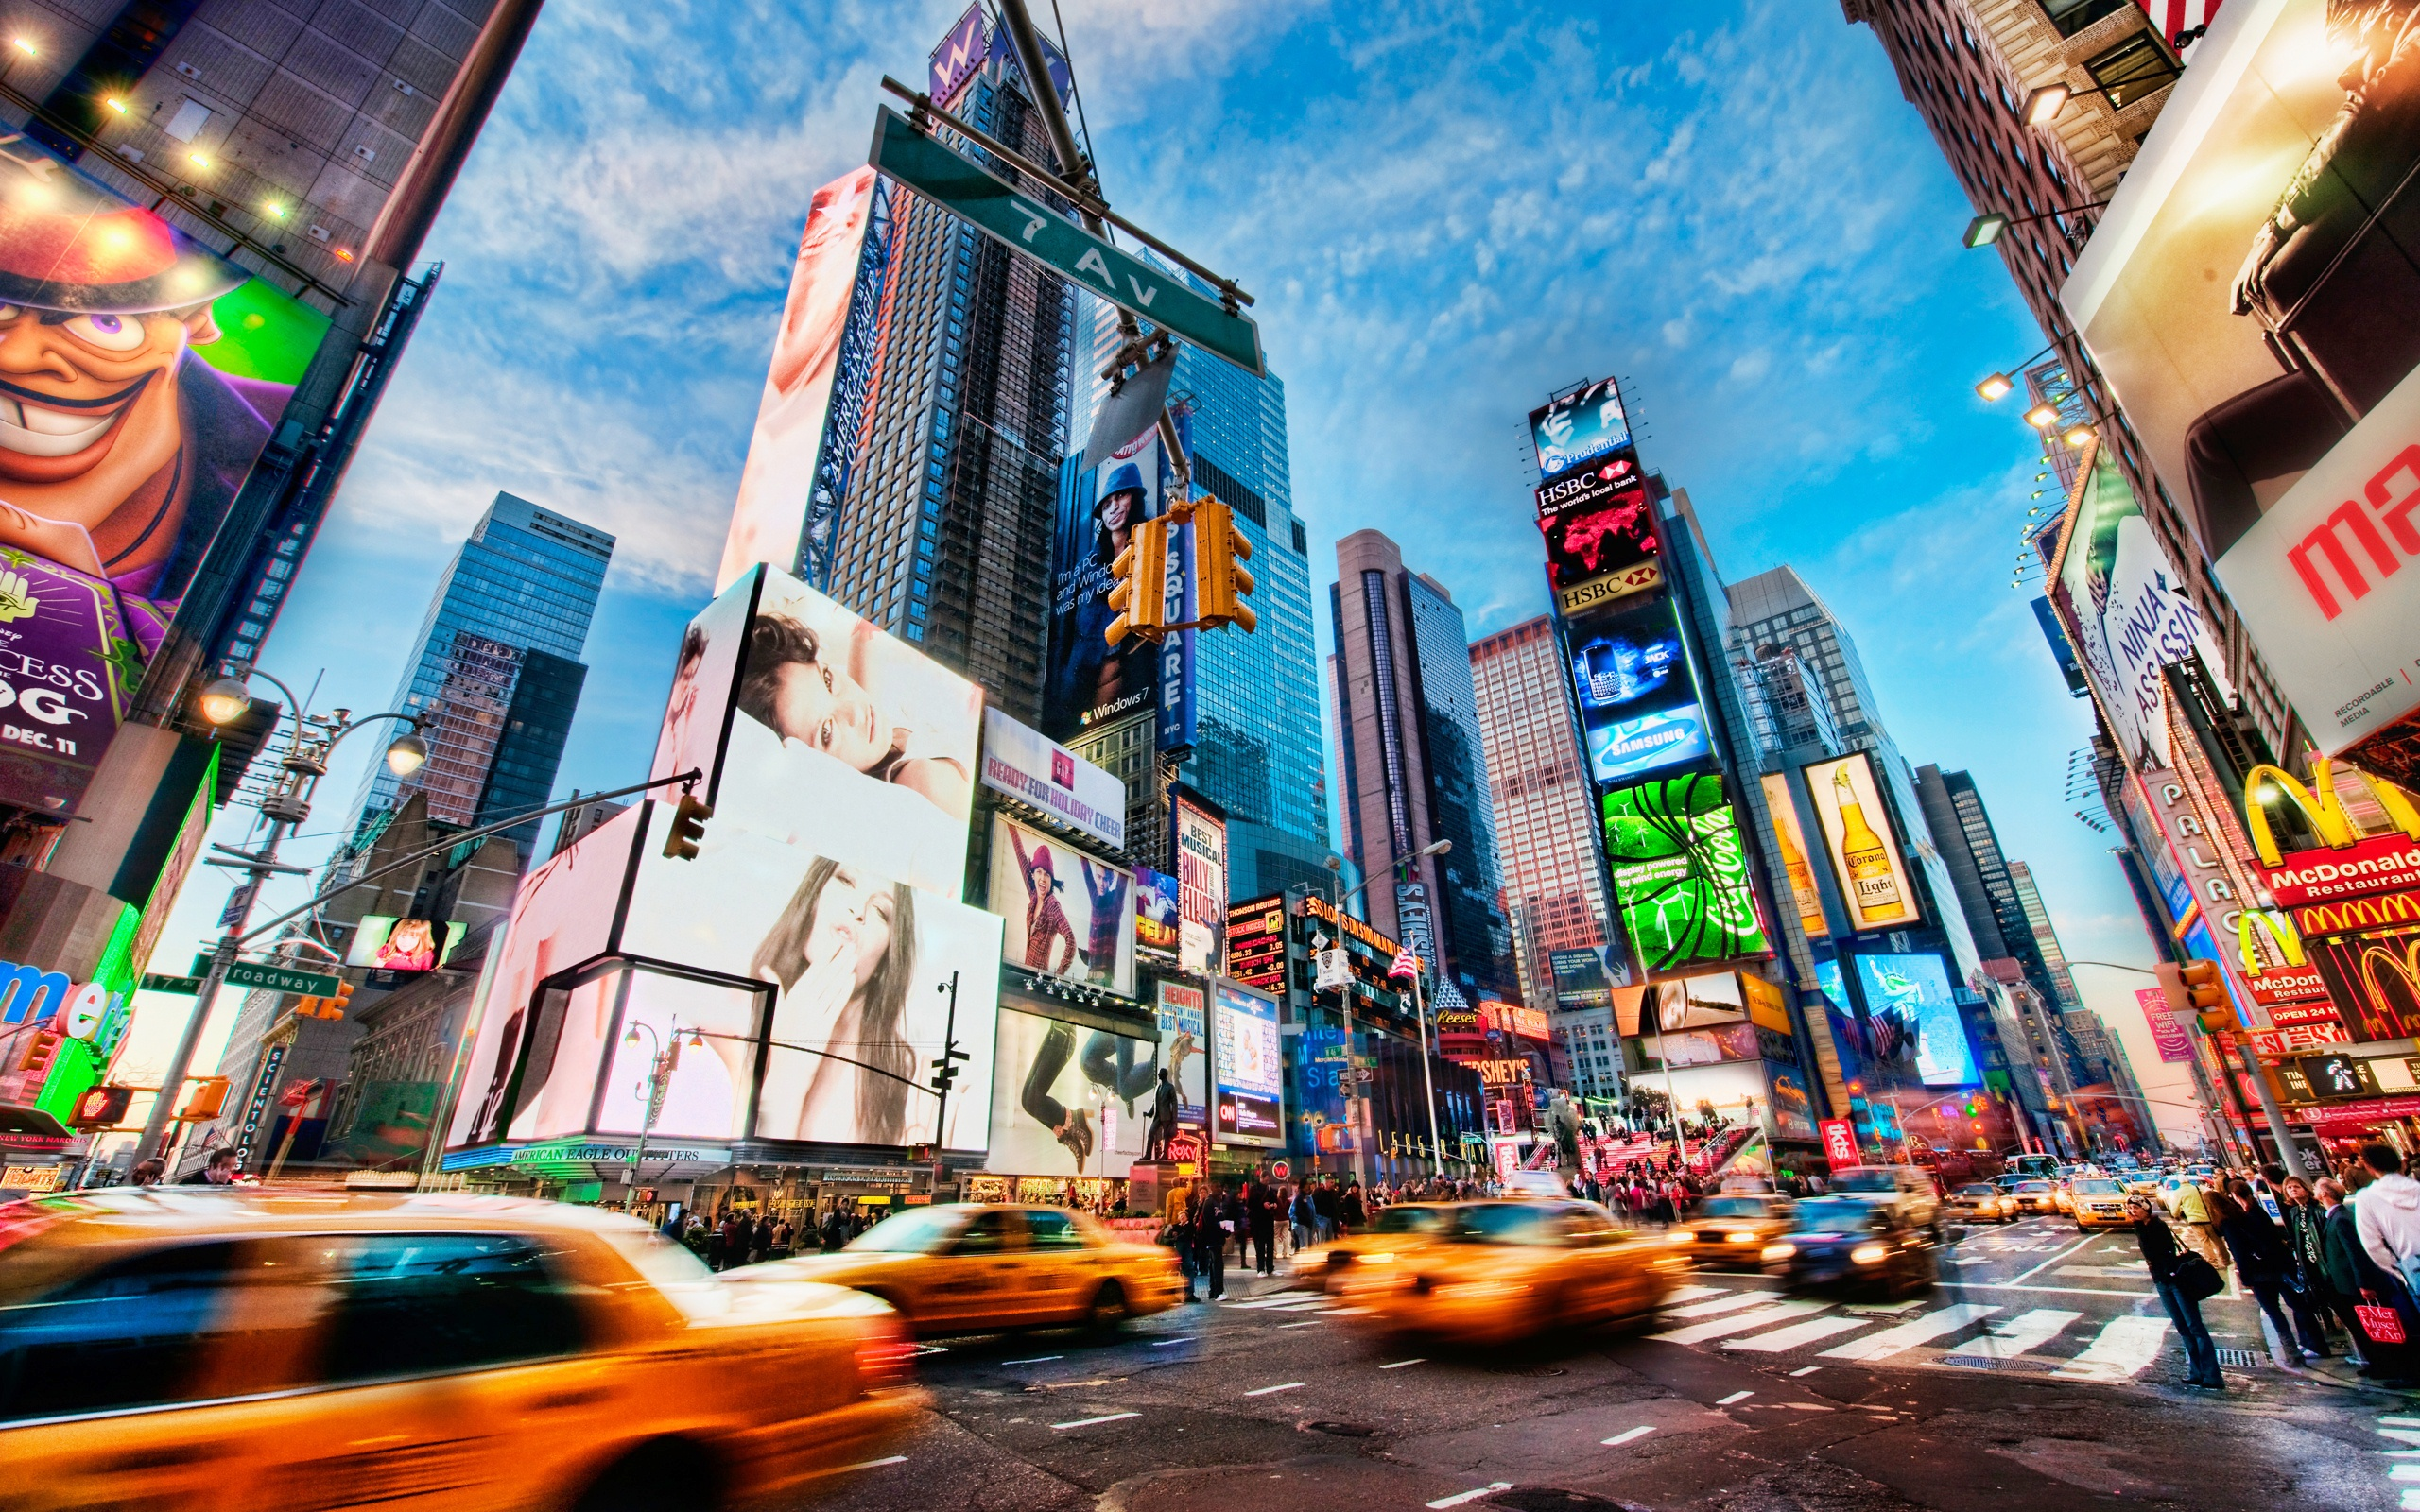 Times Square New York wallpaper